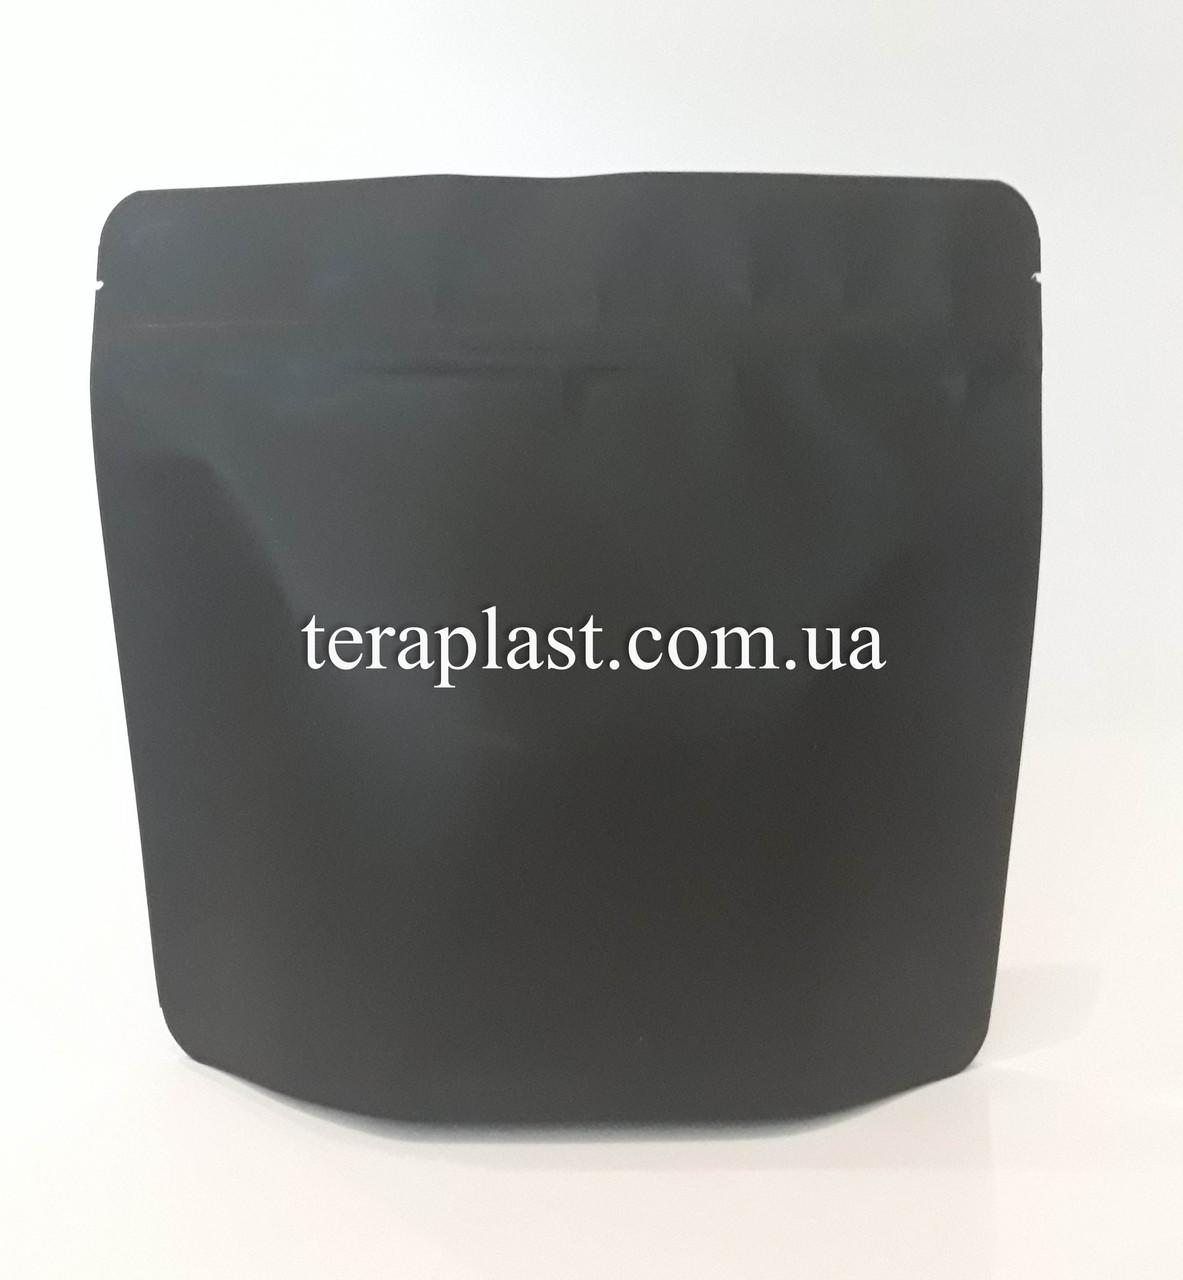 Дой-Пак 300г черный 200х190х36 зип с тактильным лаком